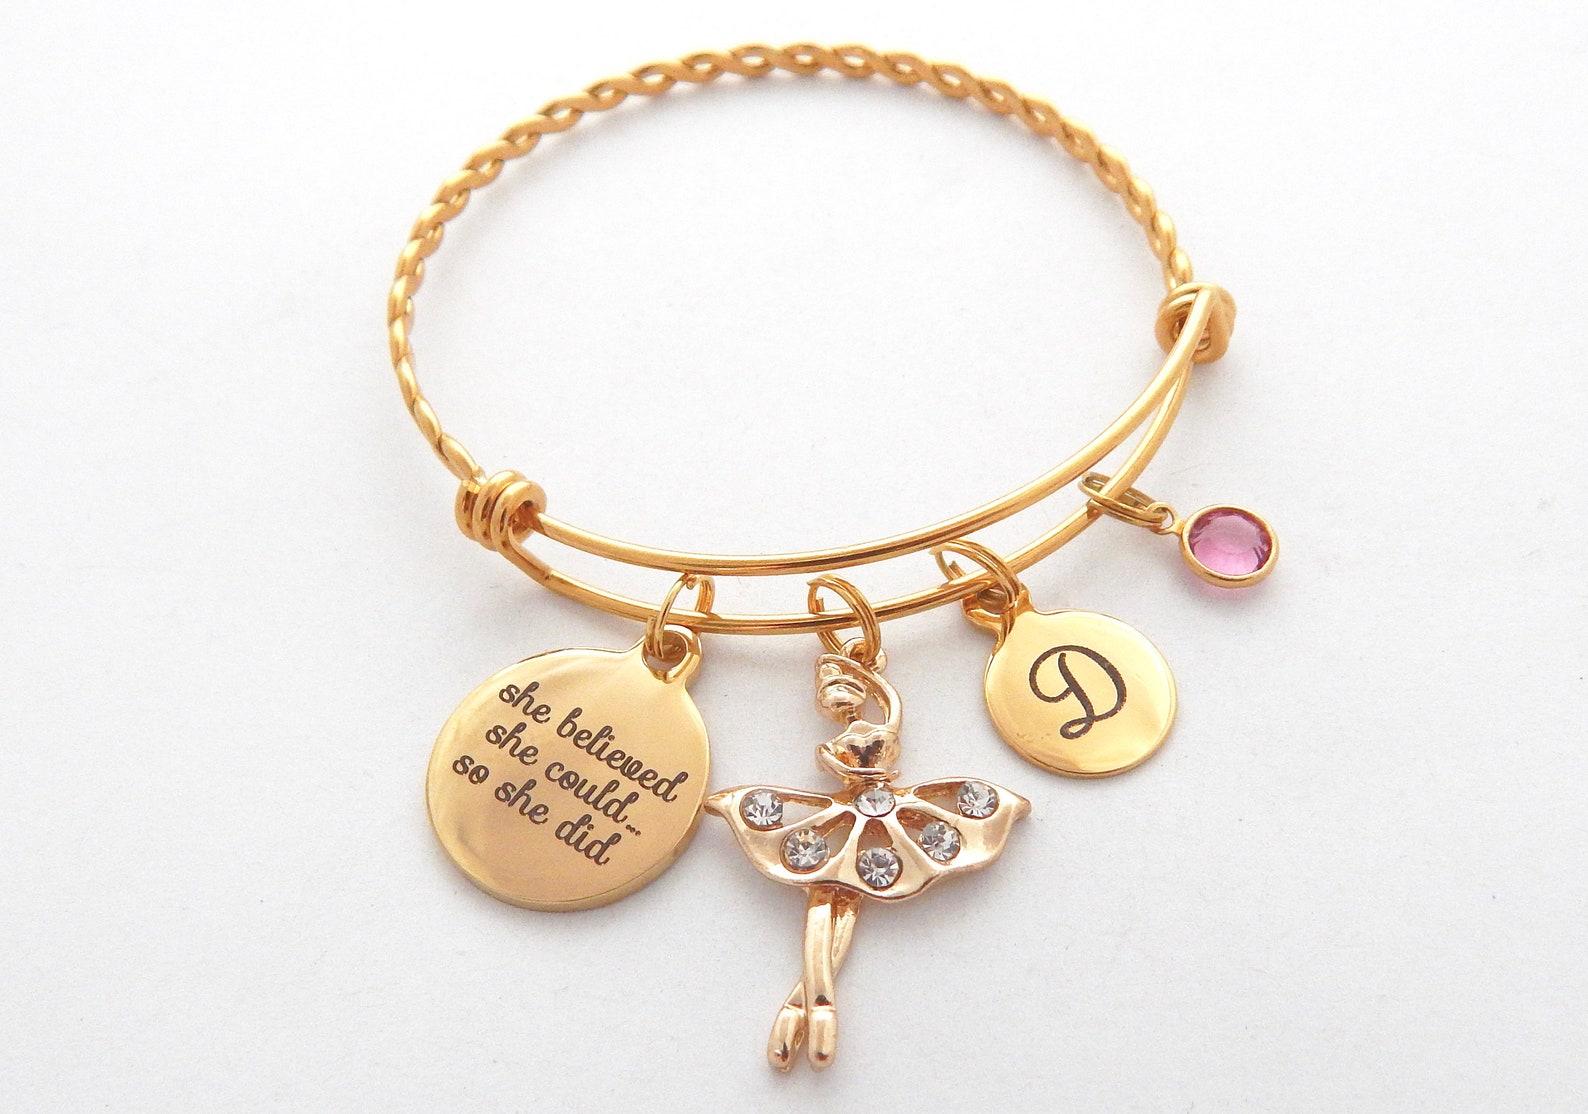 gold ballet teacher gift-gold dance instructor gift-gold gift ideas for dancers-gold gifts for dance teachers- gold ballet shoes